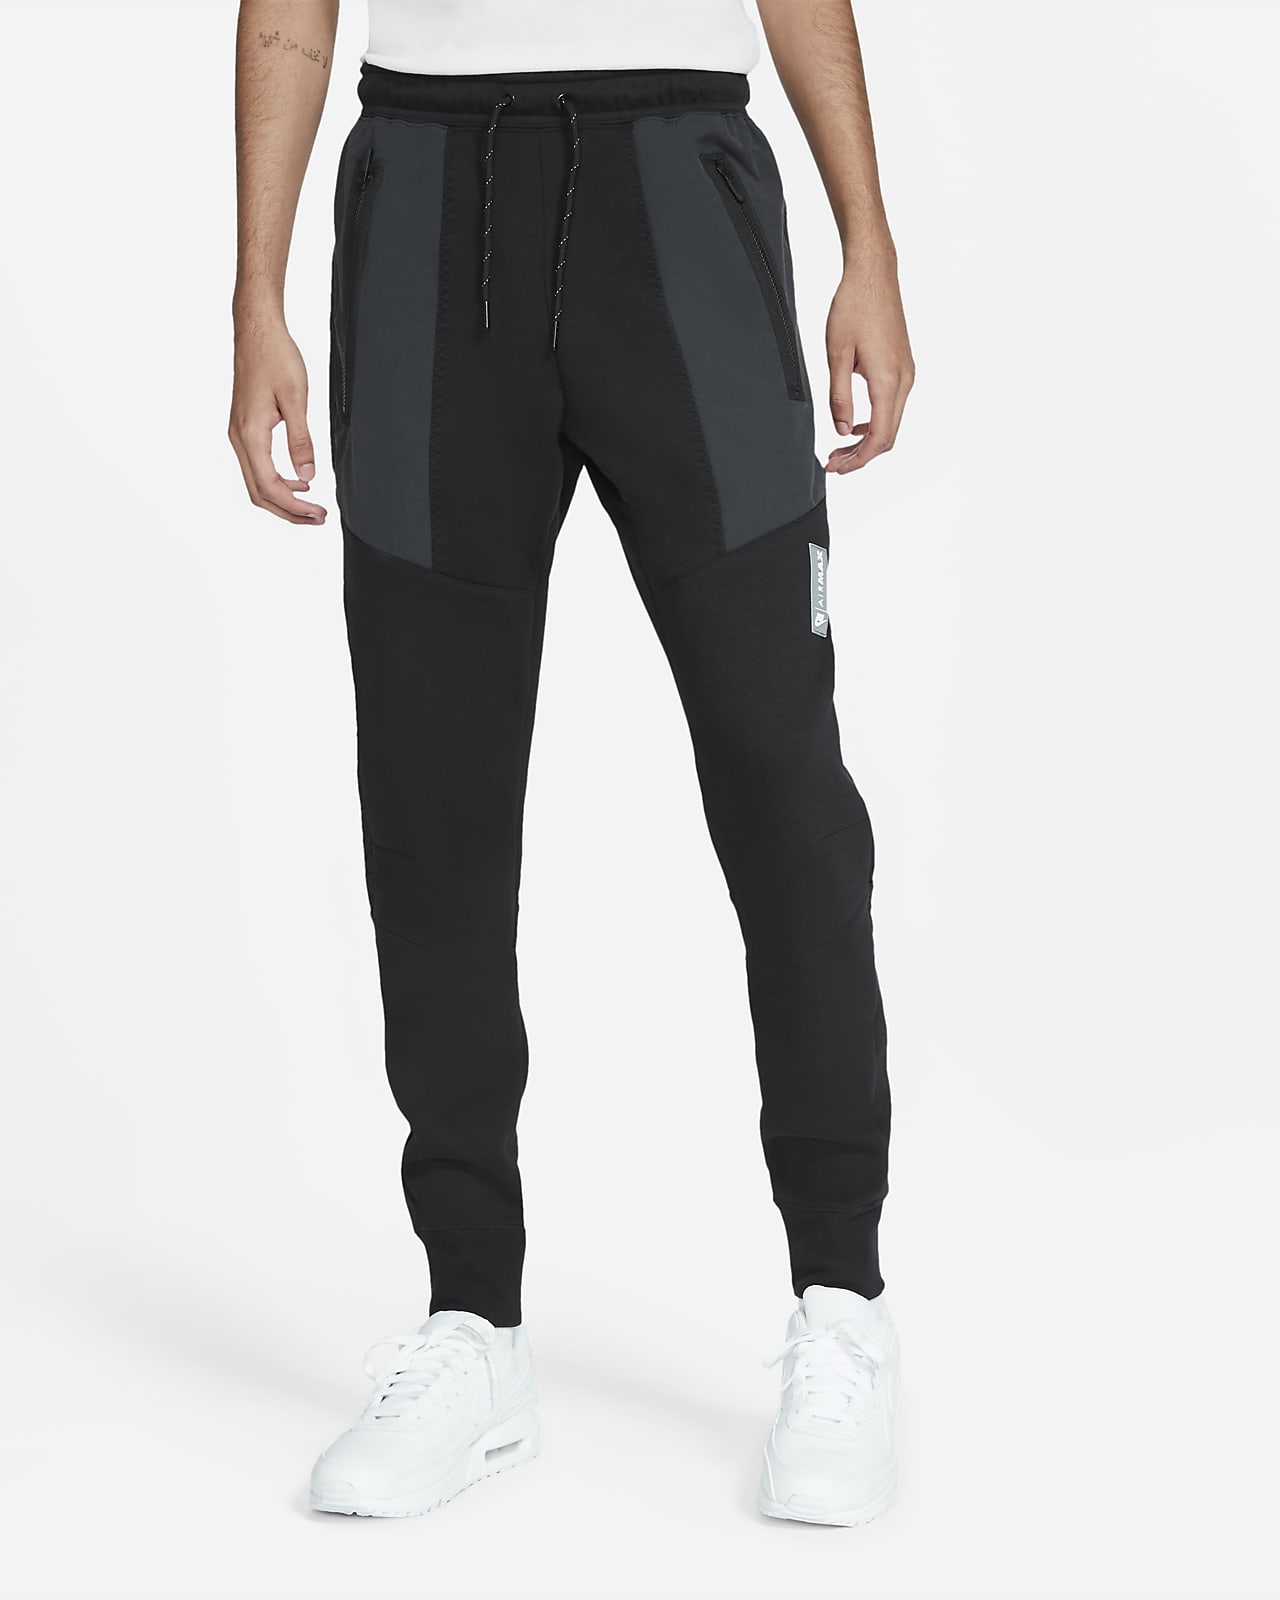 Pantalon en tissu Fleece Nike Sportswear Air Max pour Homme